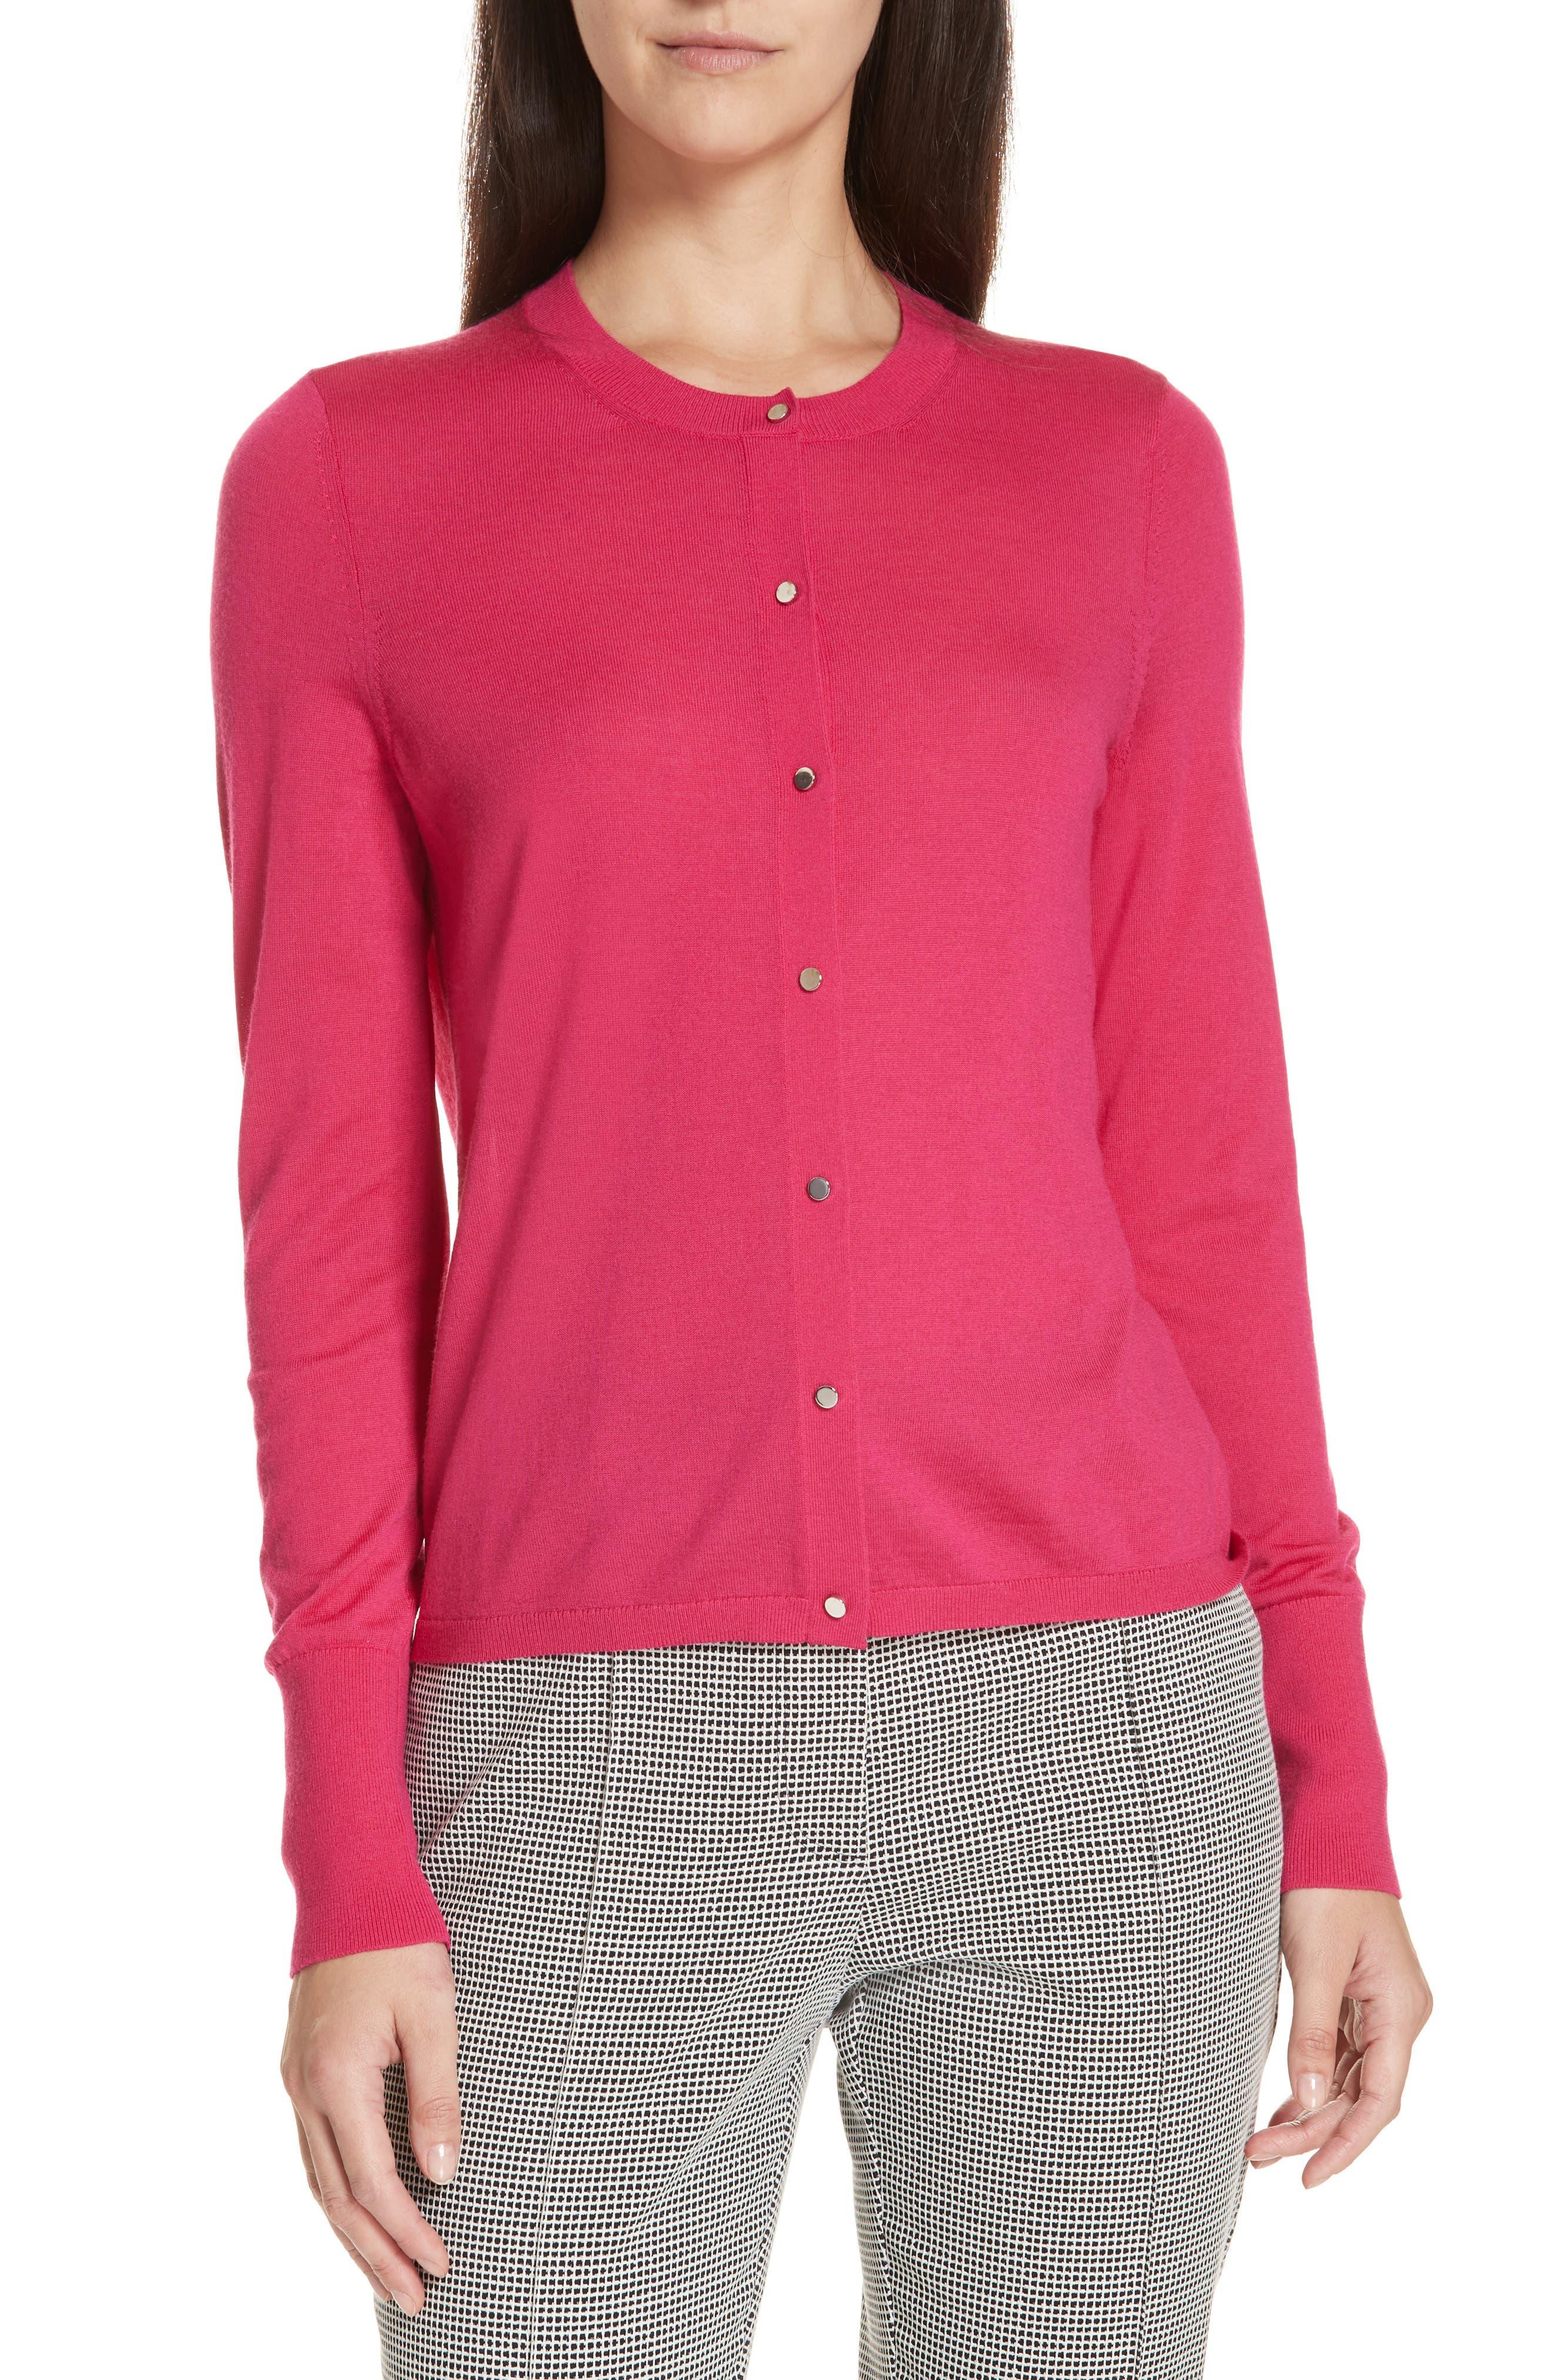 Filomeni Wool Cardigan,                         Main,                         color, DEEP PLUMBERRY